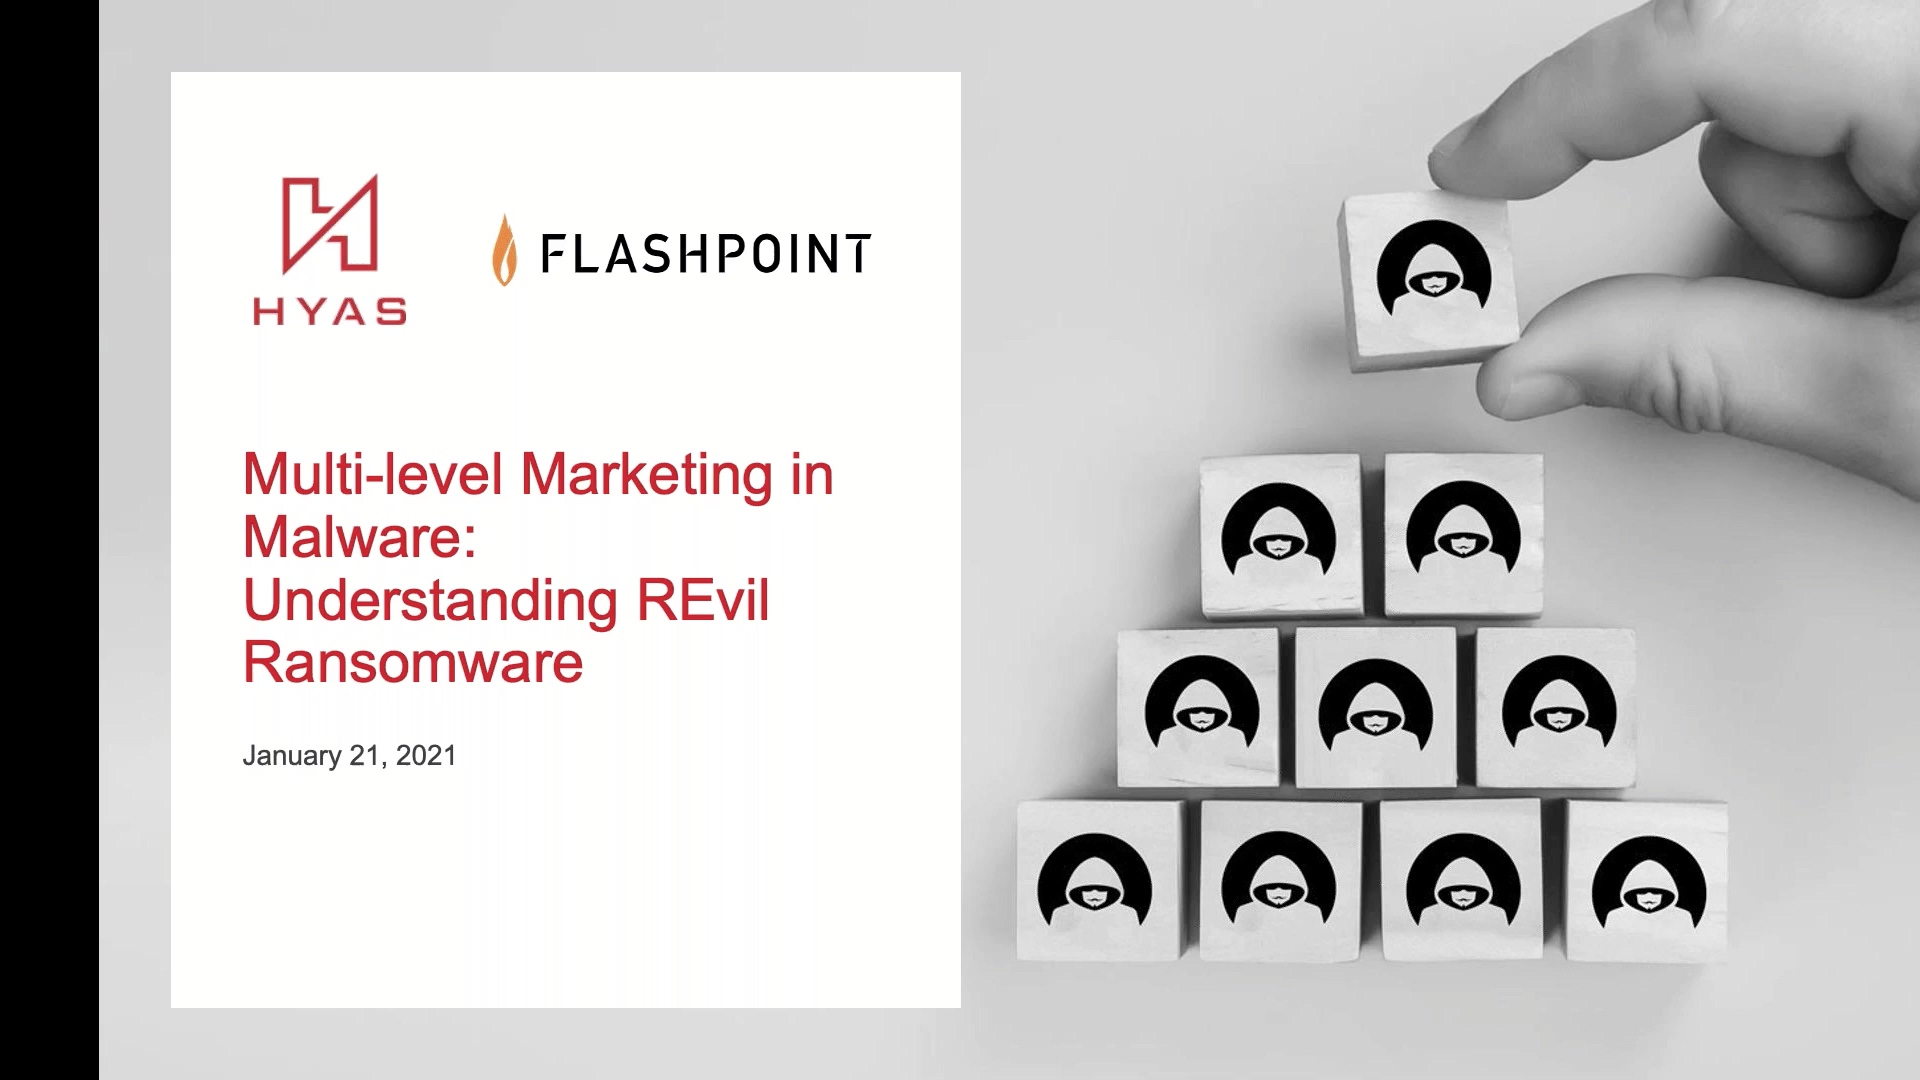 Flashpoint-HYAS-webinar-21Jan2021-thumb